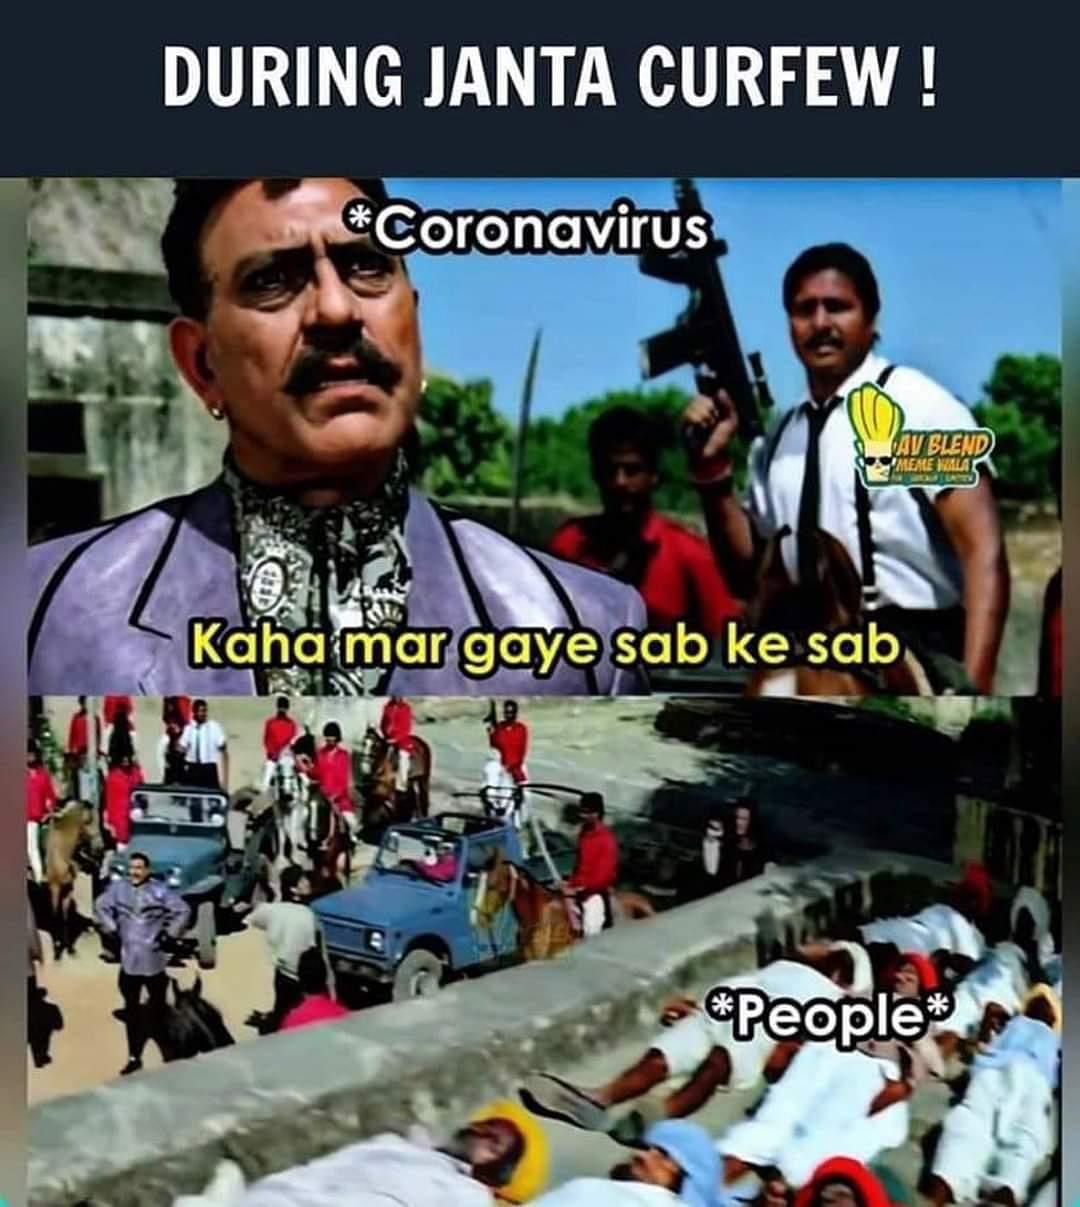 A very long list of coronavirus jokes on WhatsApp, Twitter, Facebook and Instagram